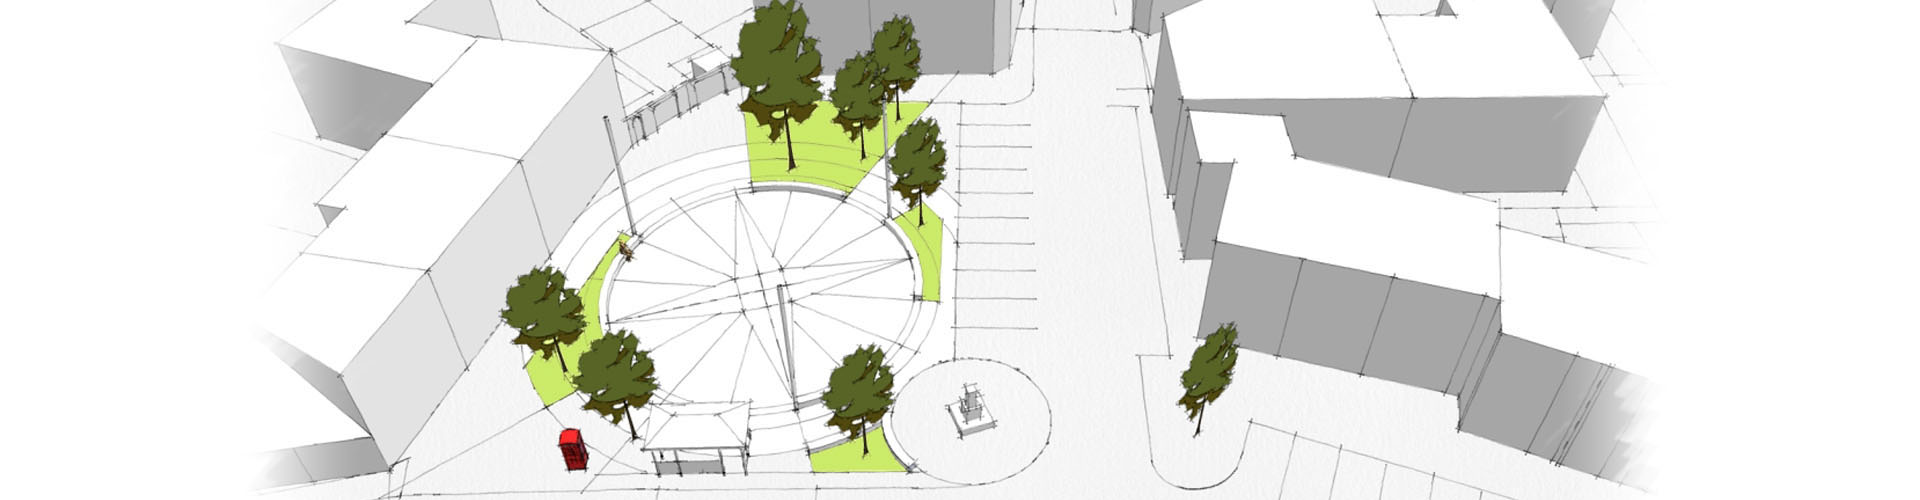 3d Modelling Bim Landscape Architects 2b